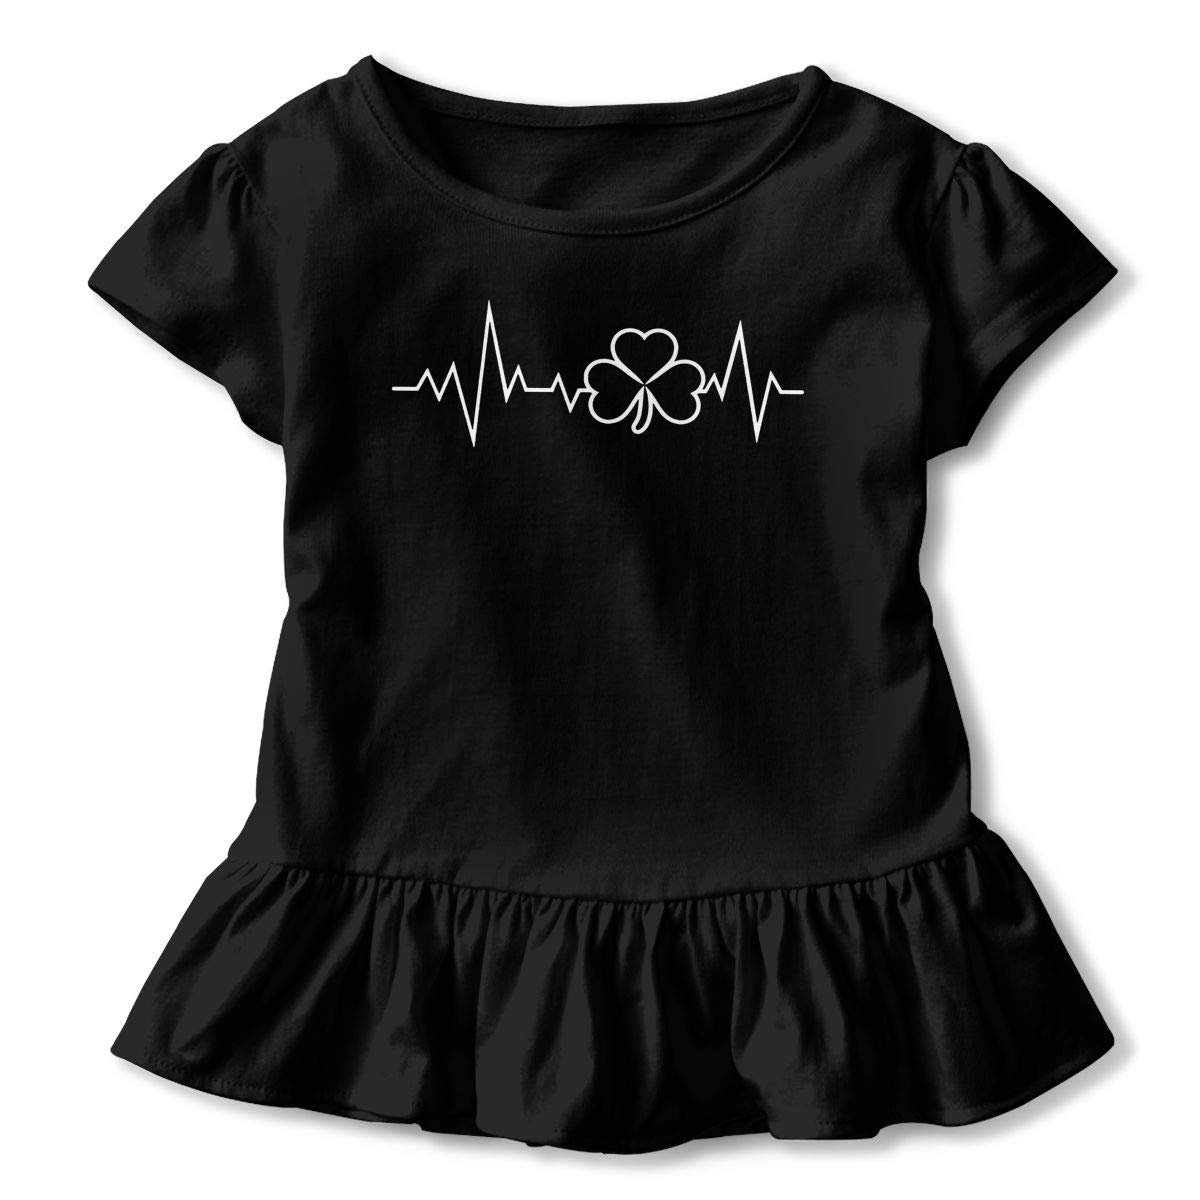 St Patricks Day Heartbeat Shamrock Toddler//Infant Girls Short Sleeve T Shirts Ruffles Shirt Tee Jersey for 2-6T